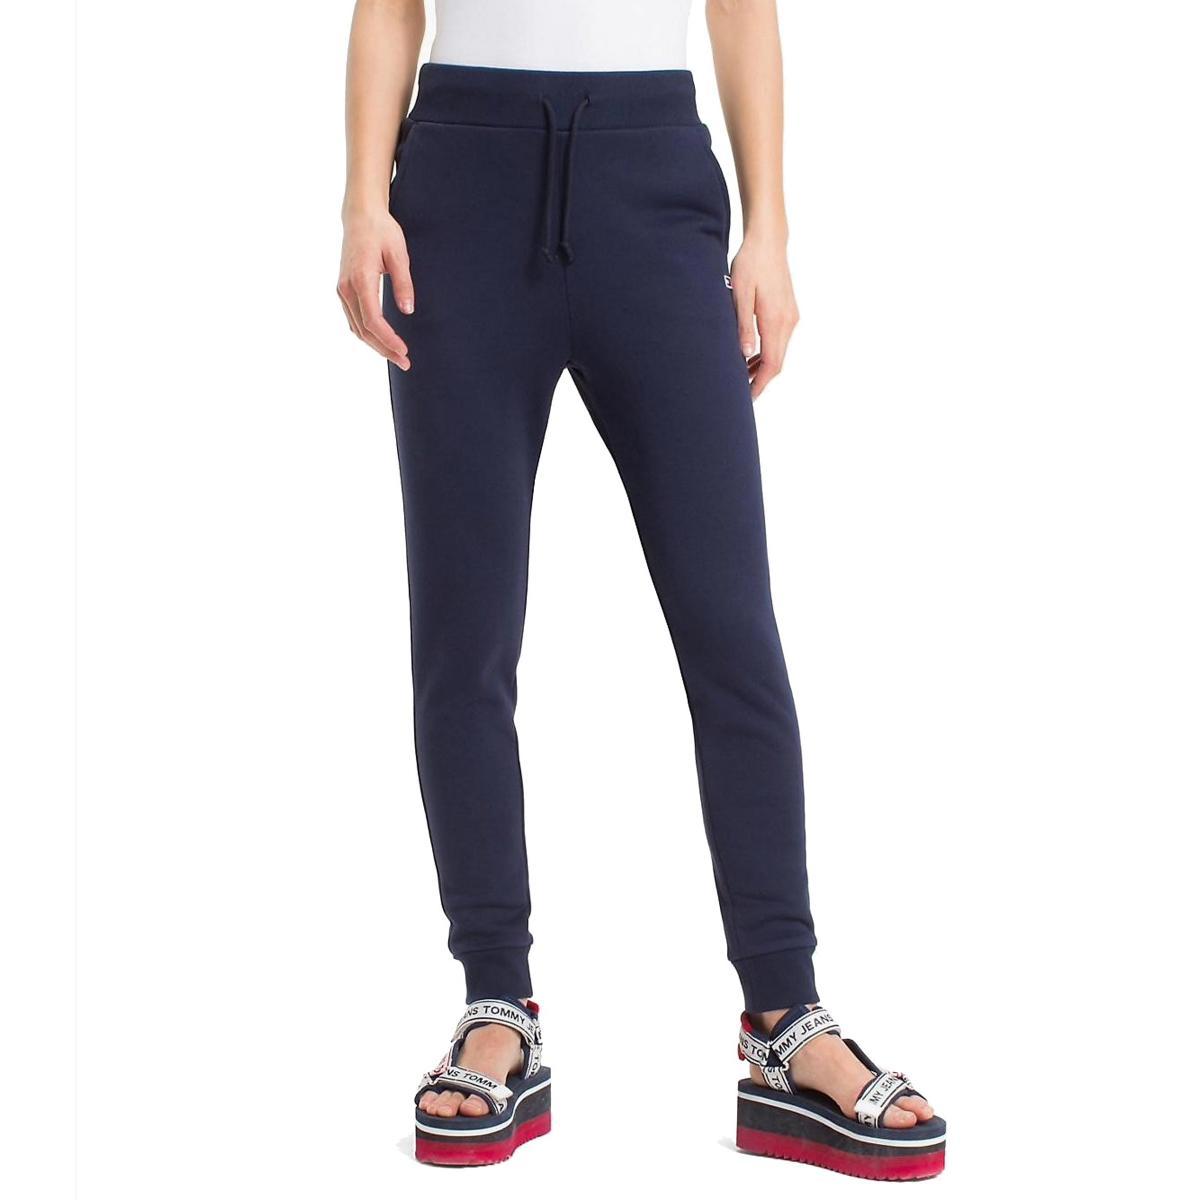 Pantalone Joggers Tommy Hilfiger Jeans Classics da donna rif. DW0DW04575